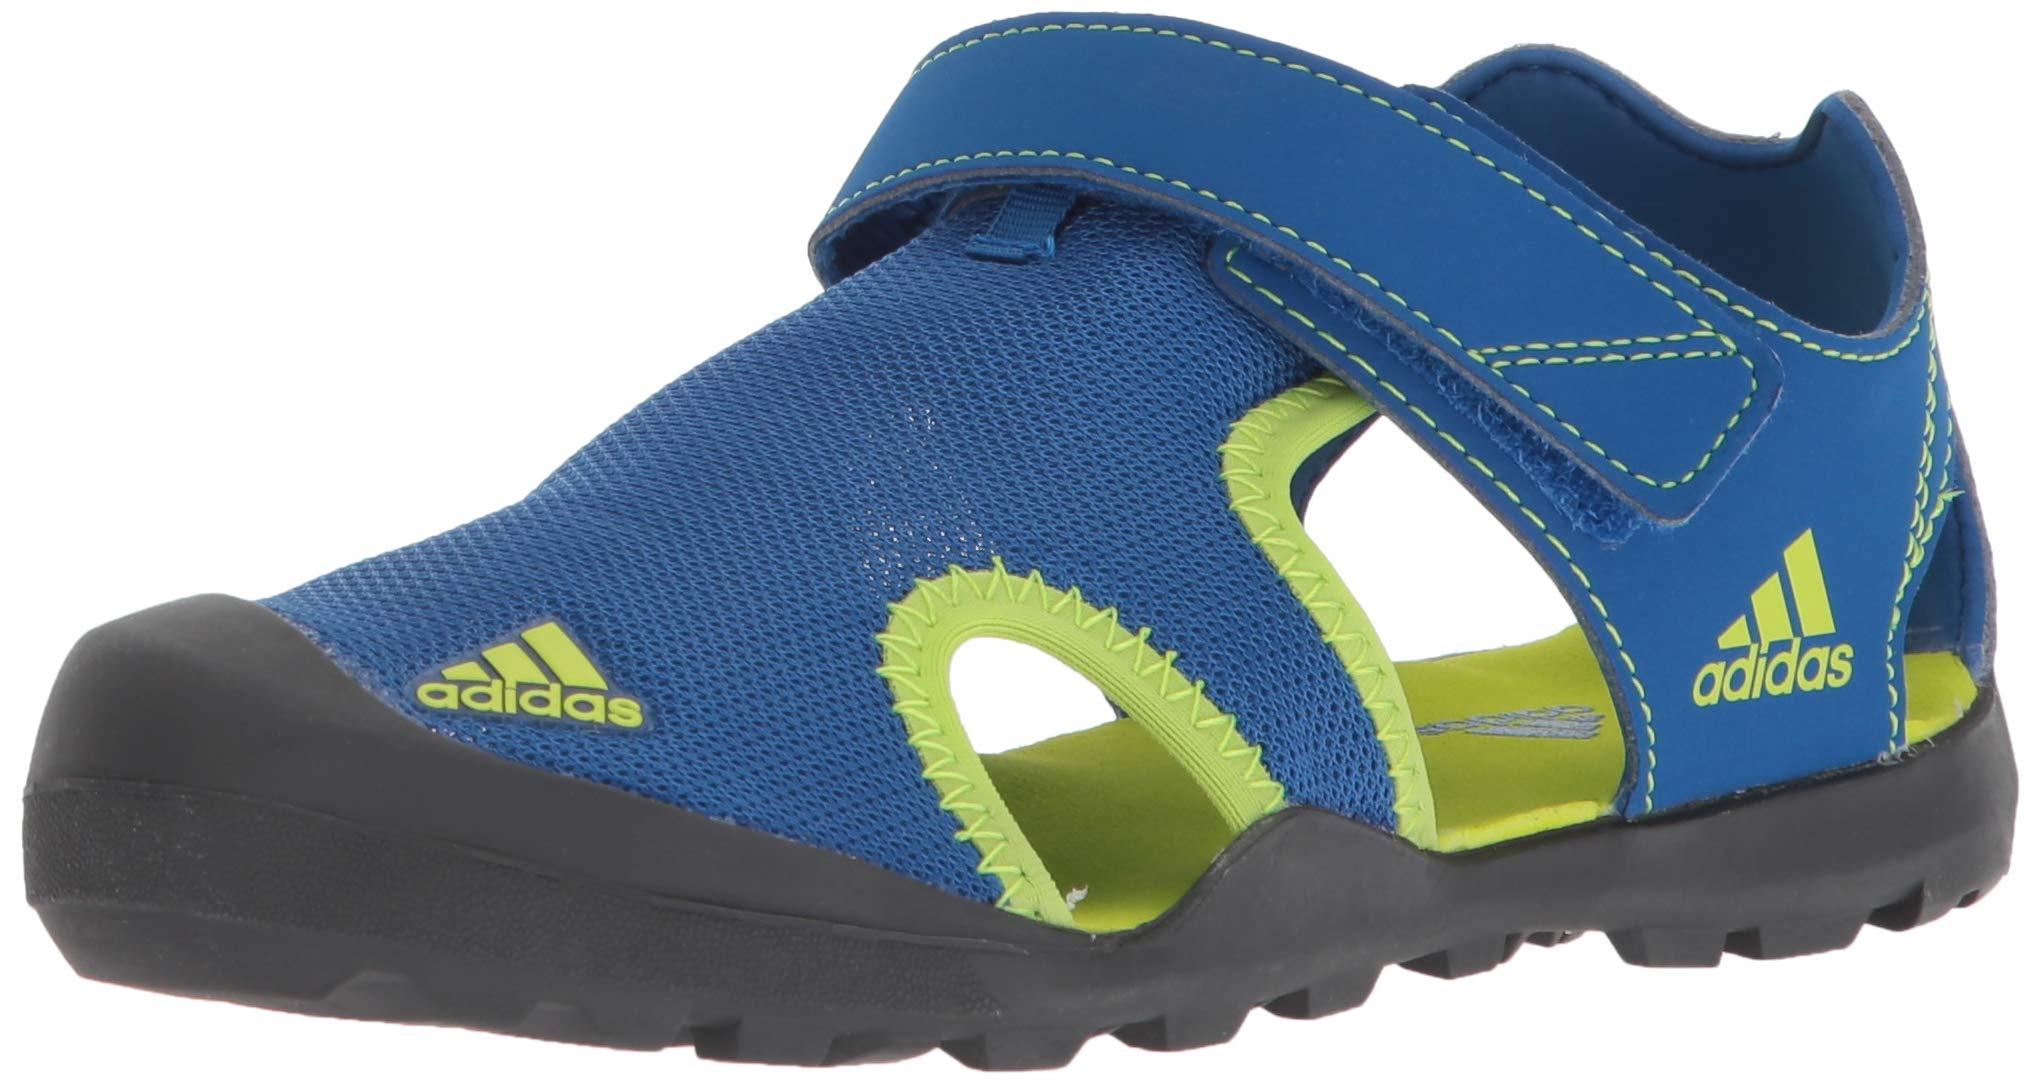 adidas outdoor Unisex Captain TOEY K, Blue Beauty/Solar Slime/Carbon 6 Medium Youth US Big Kid